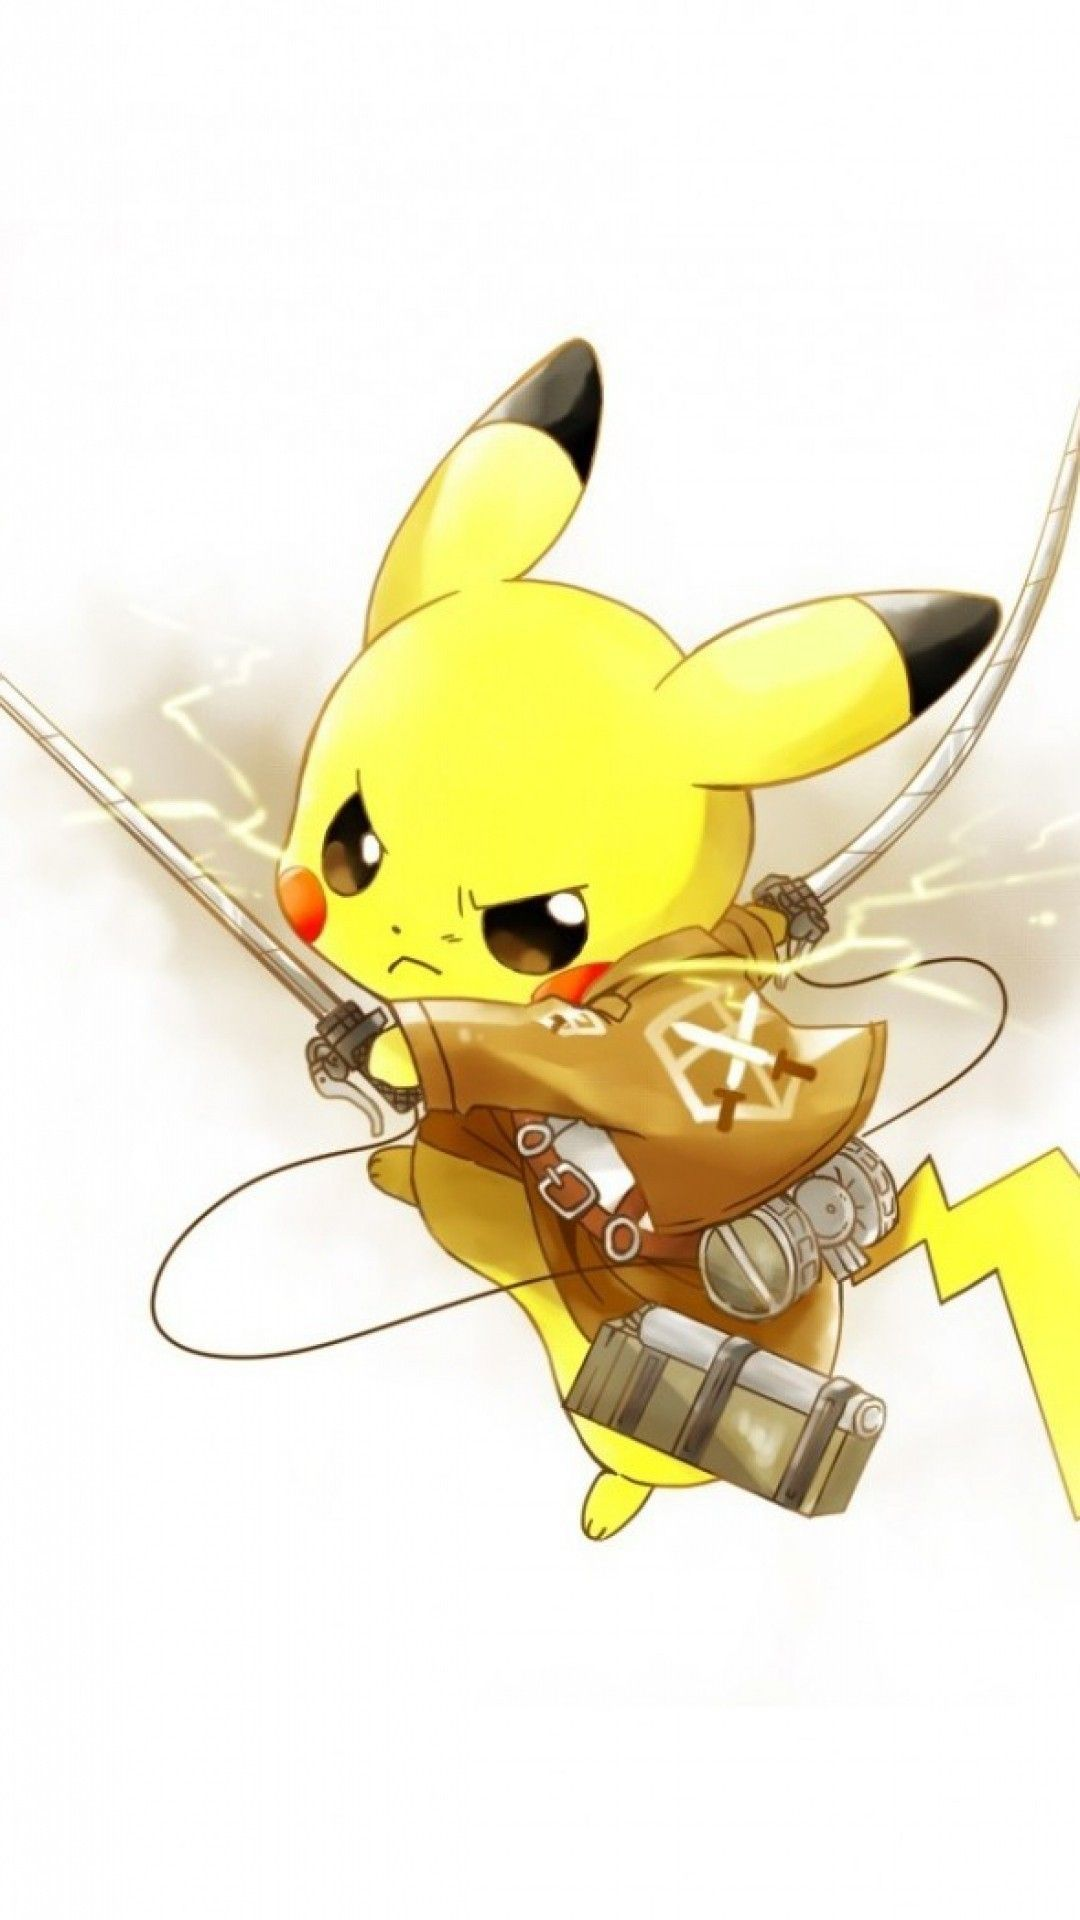 Pokemon Cool iPhone xr wallpaper